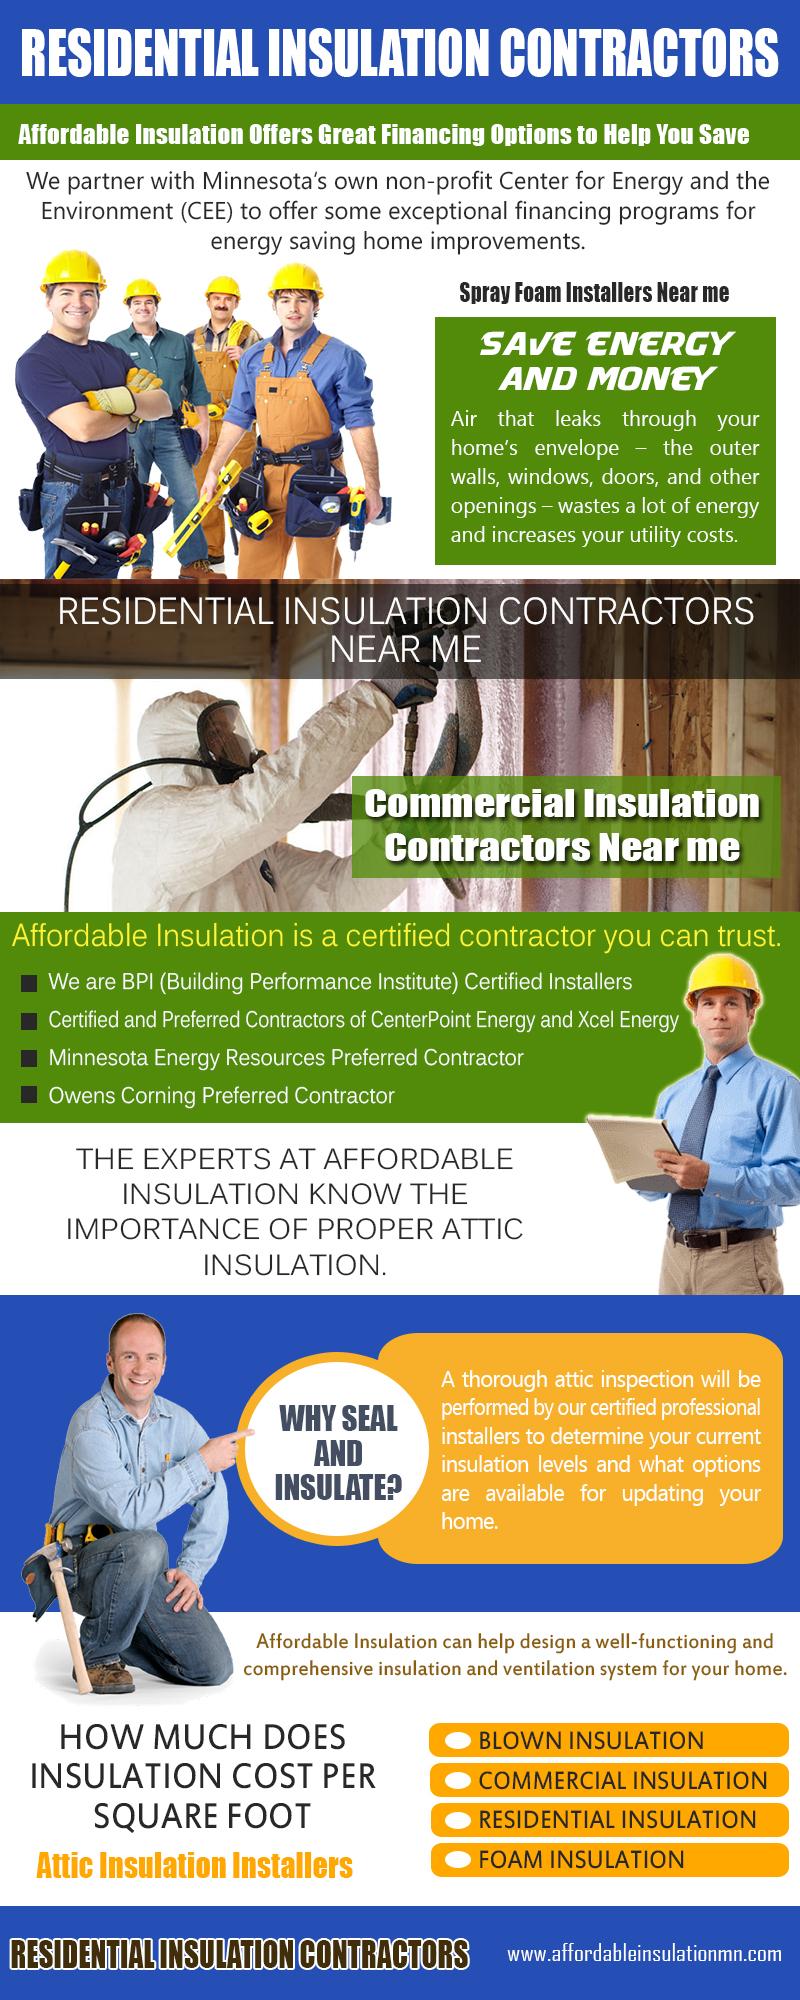 Residential Insulation Contractors   612 333 7627   affordableinsulationmn.com